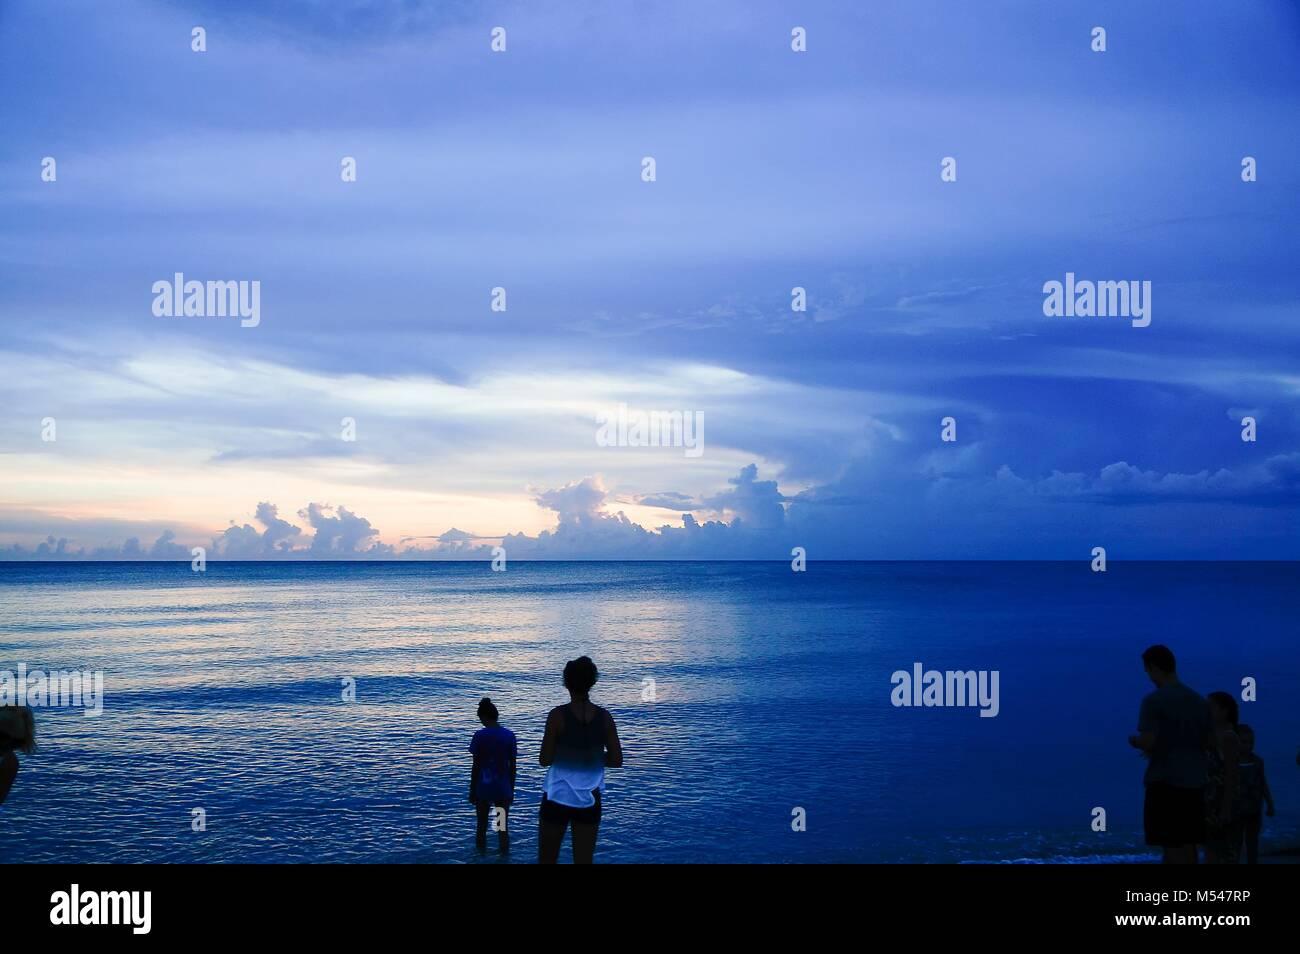 Sanibel Island, Florida - sunset on the beach Stock Photo